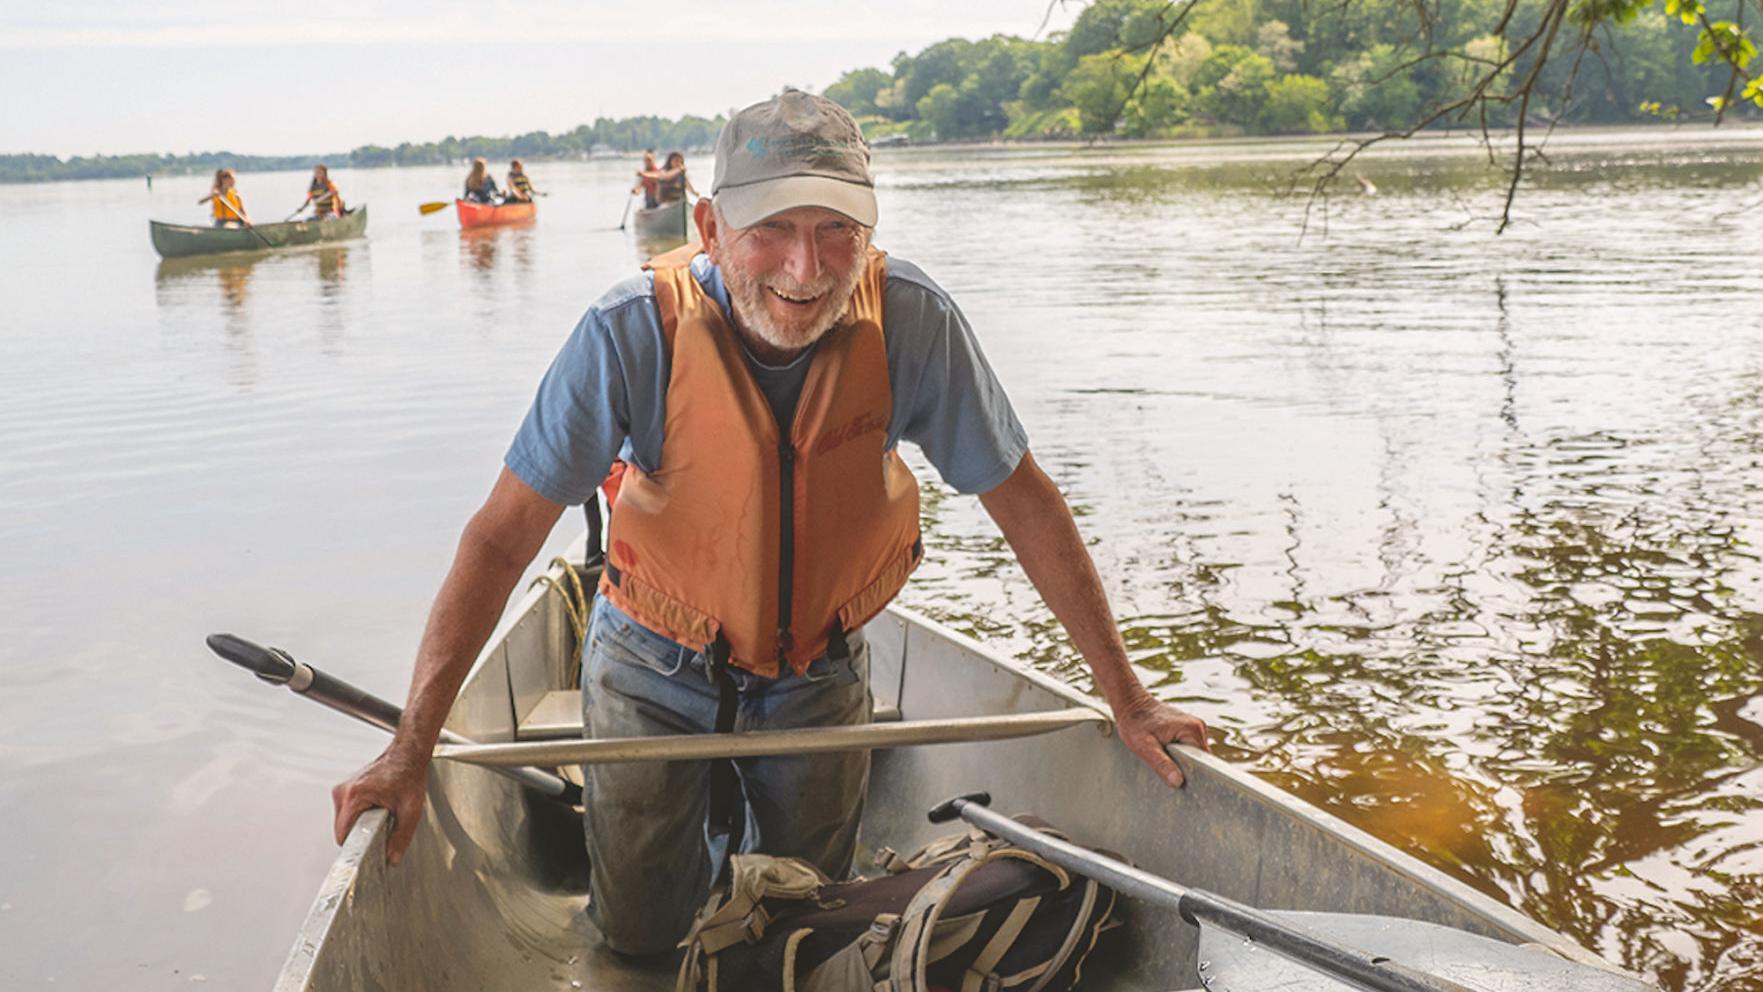 Wayne Gilchrest: outdoor teacher, congressman 'too good to be true'